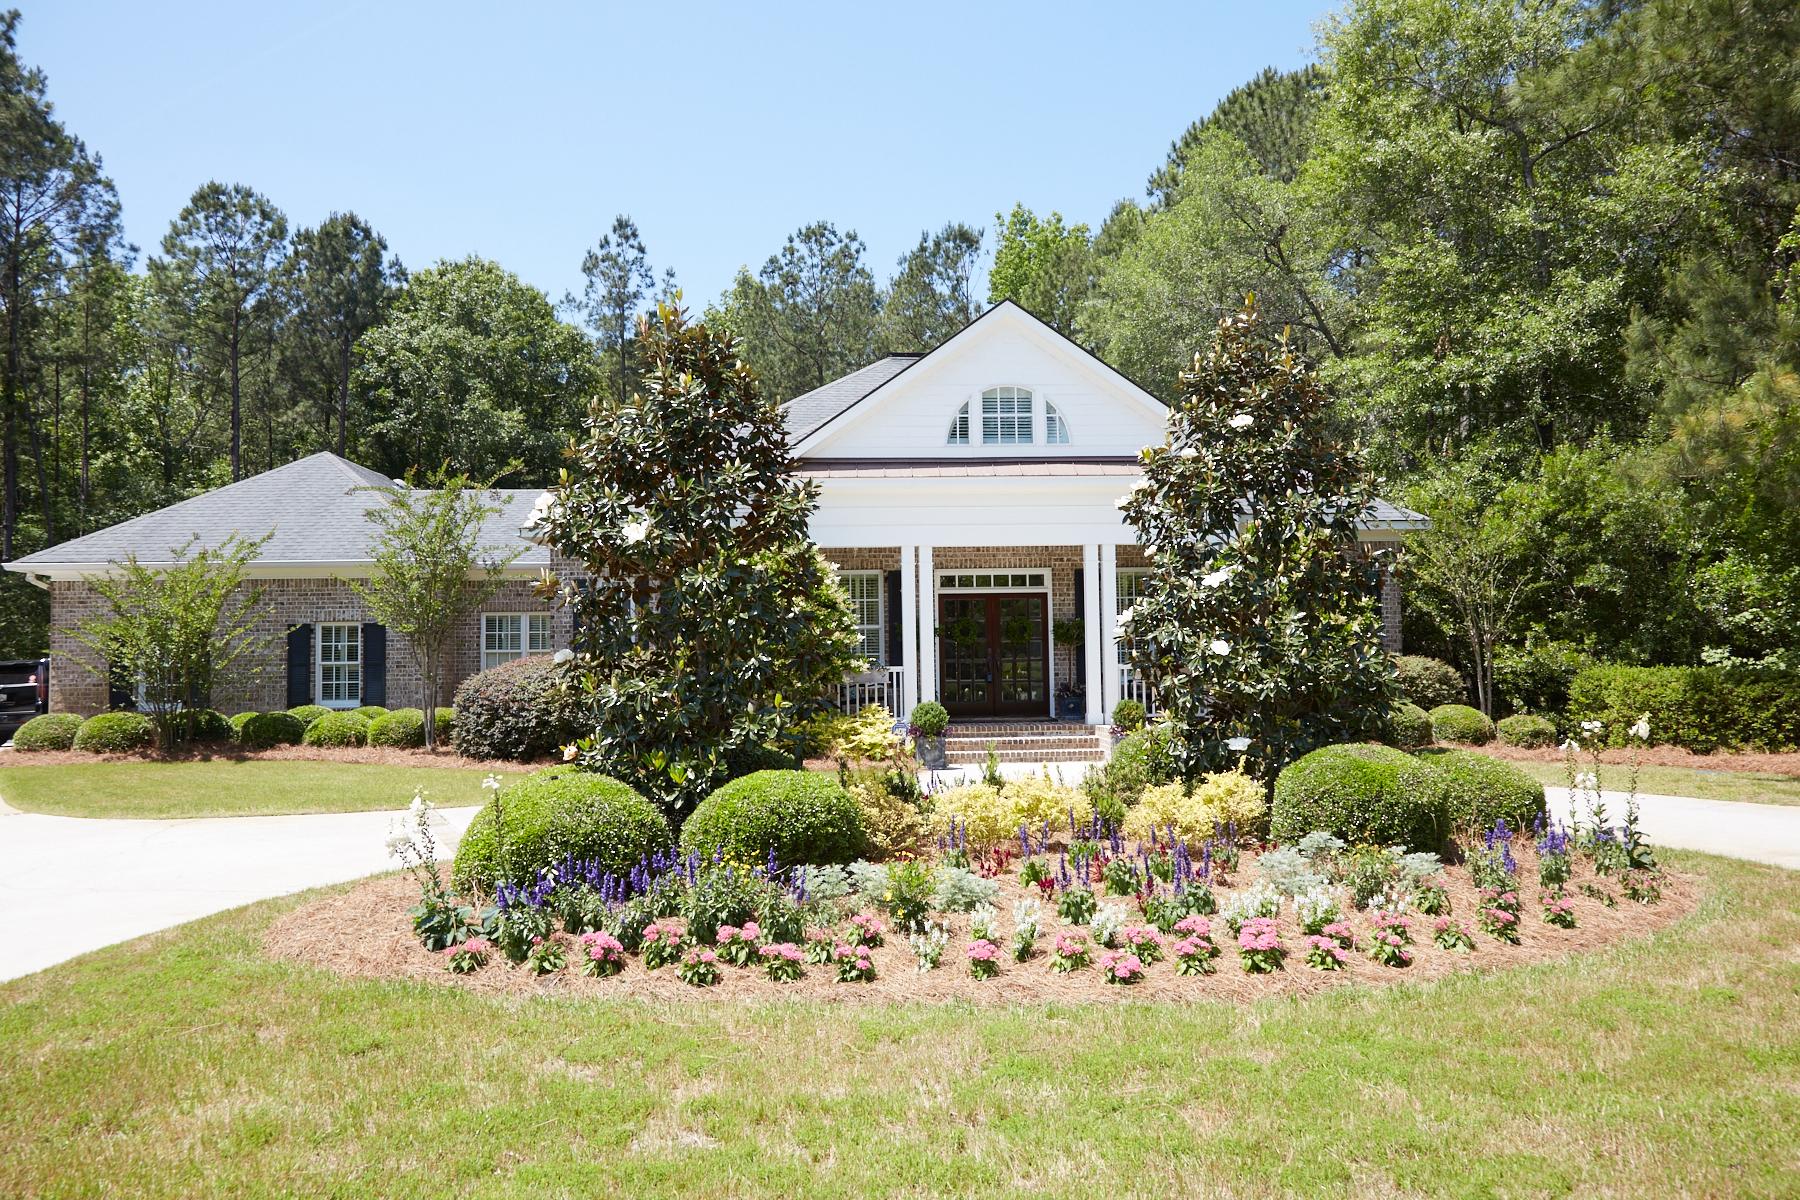 Villa per Vendita alle ore 313 Spanton Crescent 313 Spanton Crescent Pooler, Georgia 31322 Stati Uniti